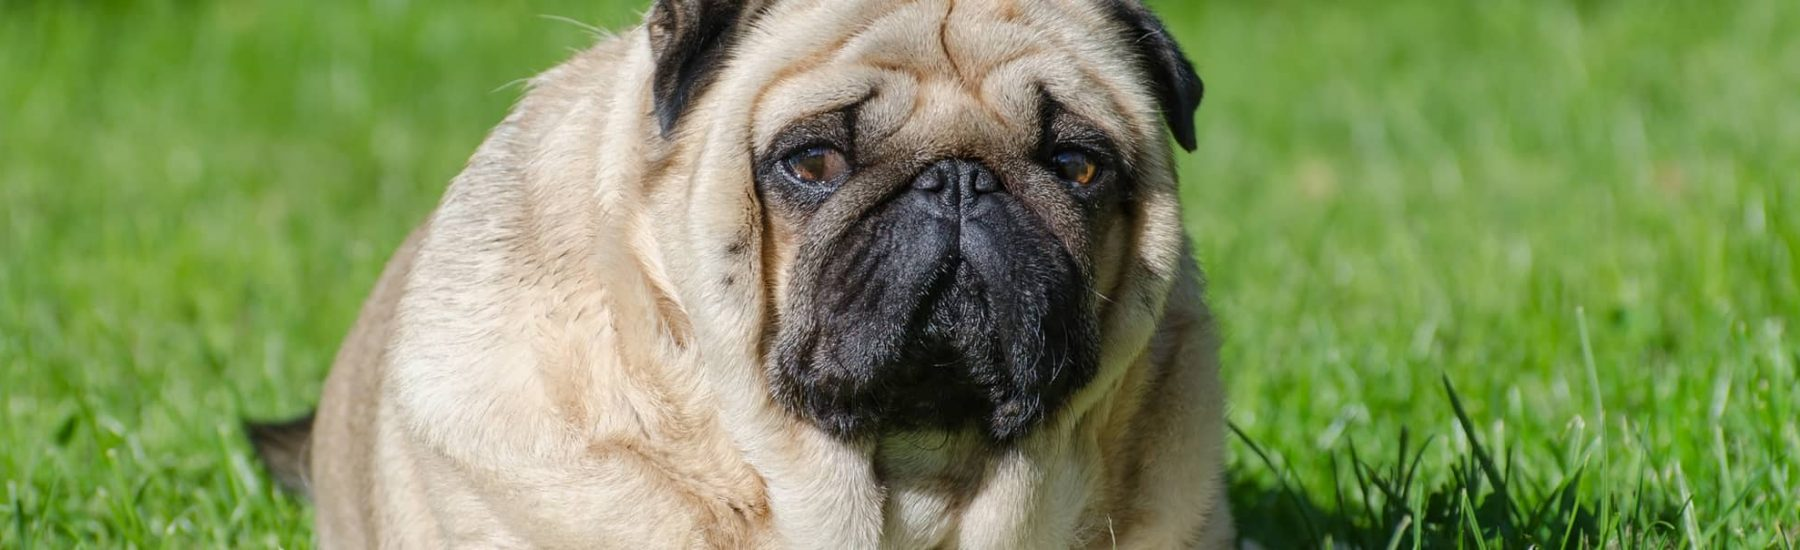 Overweight dog sitting on grass